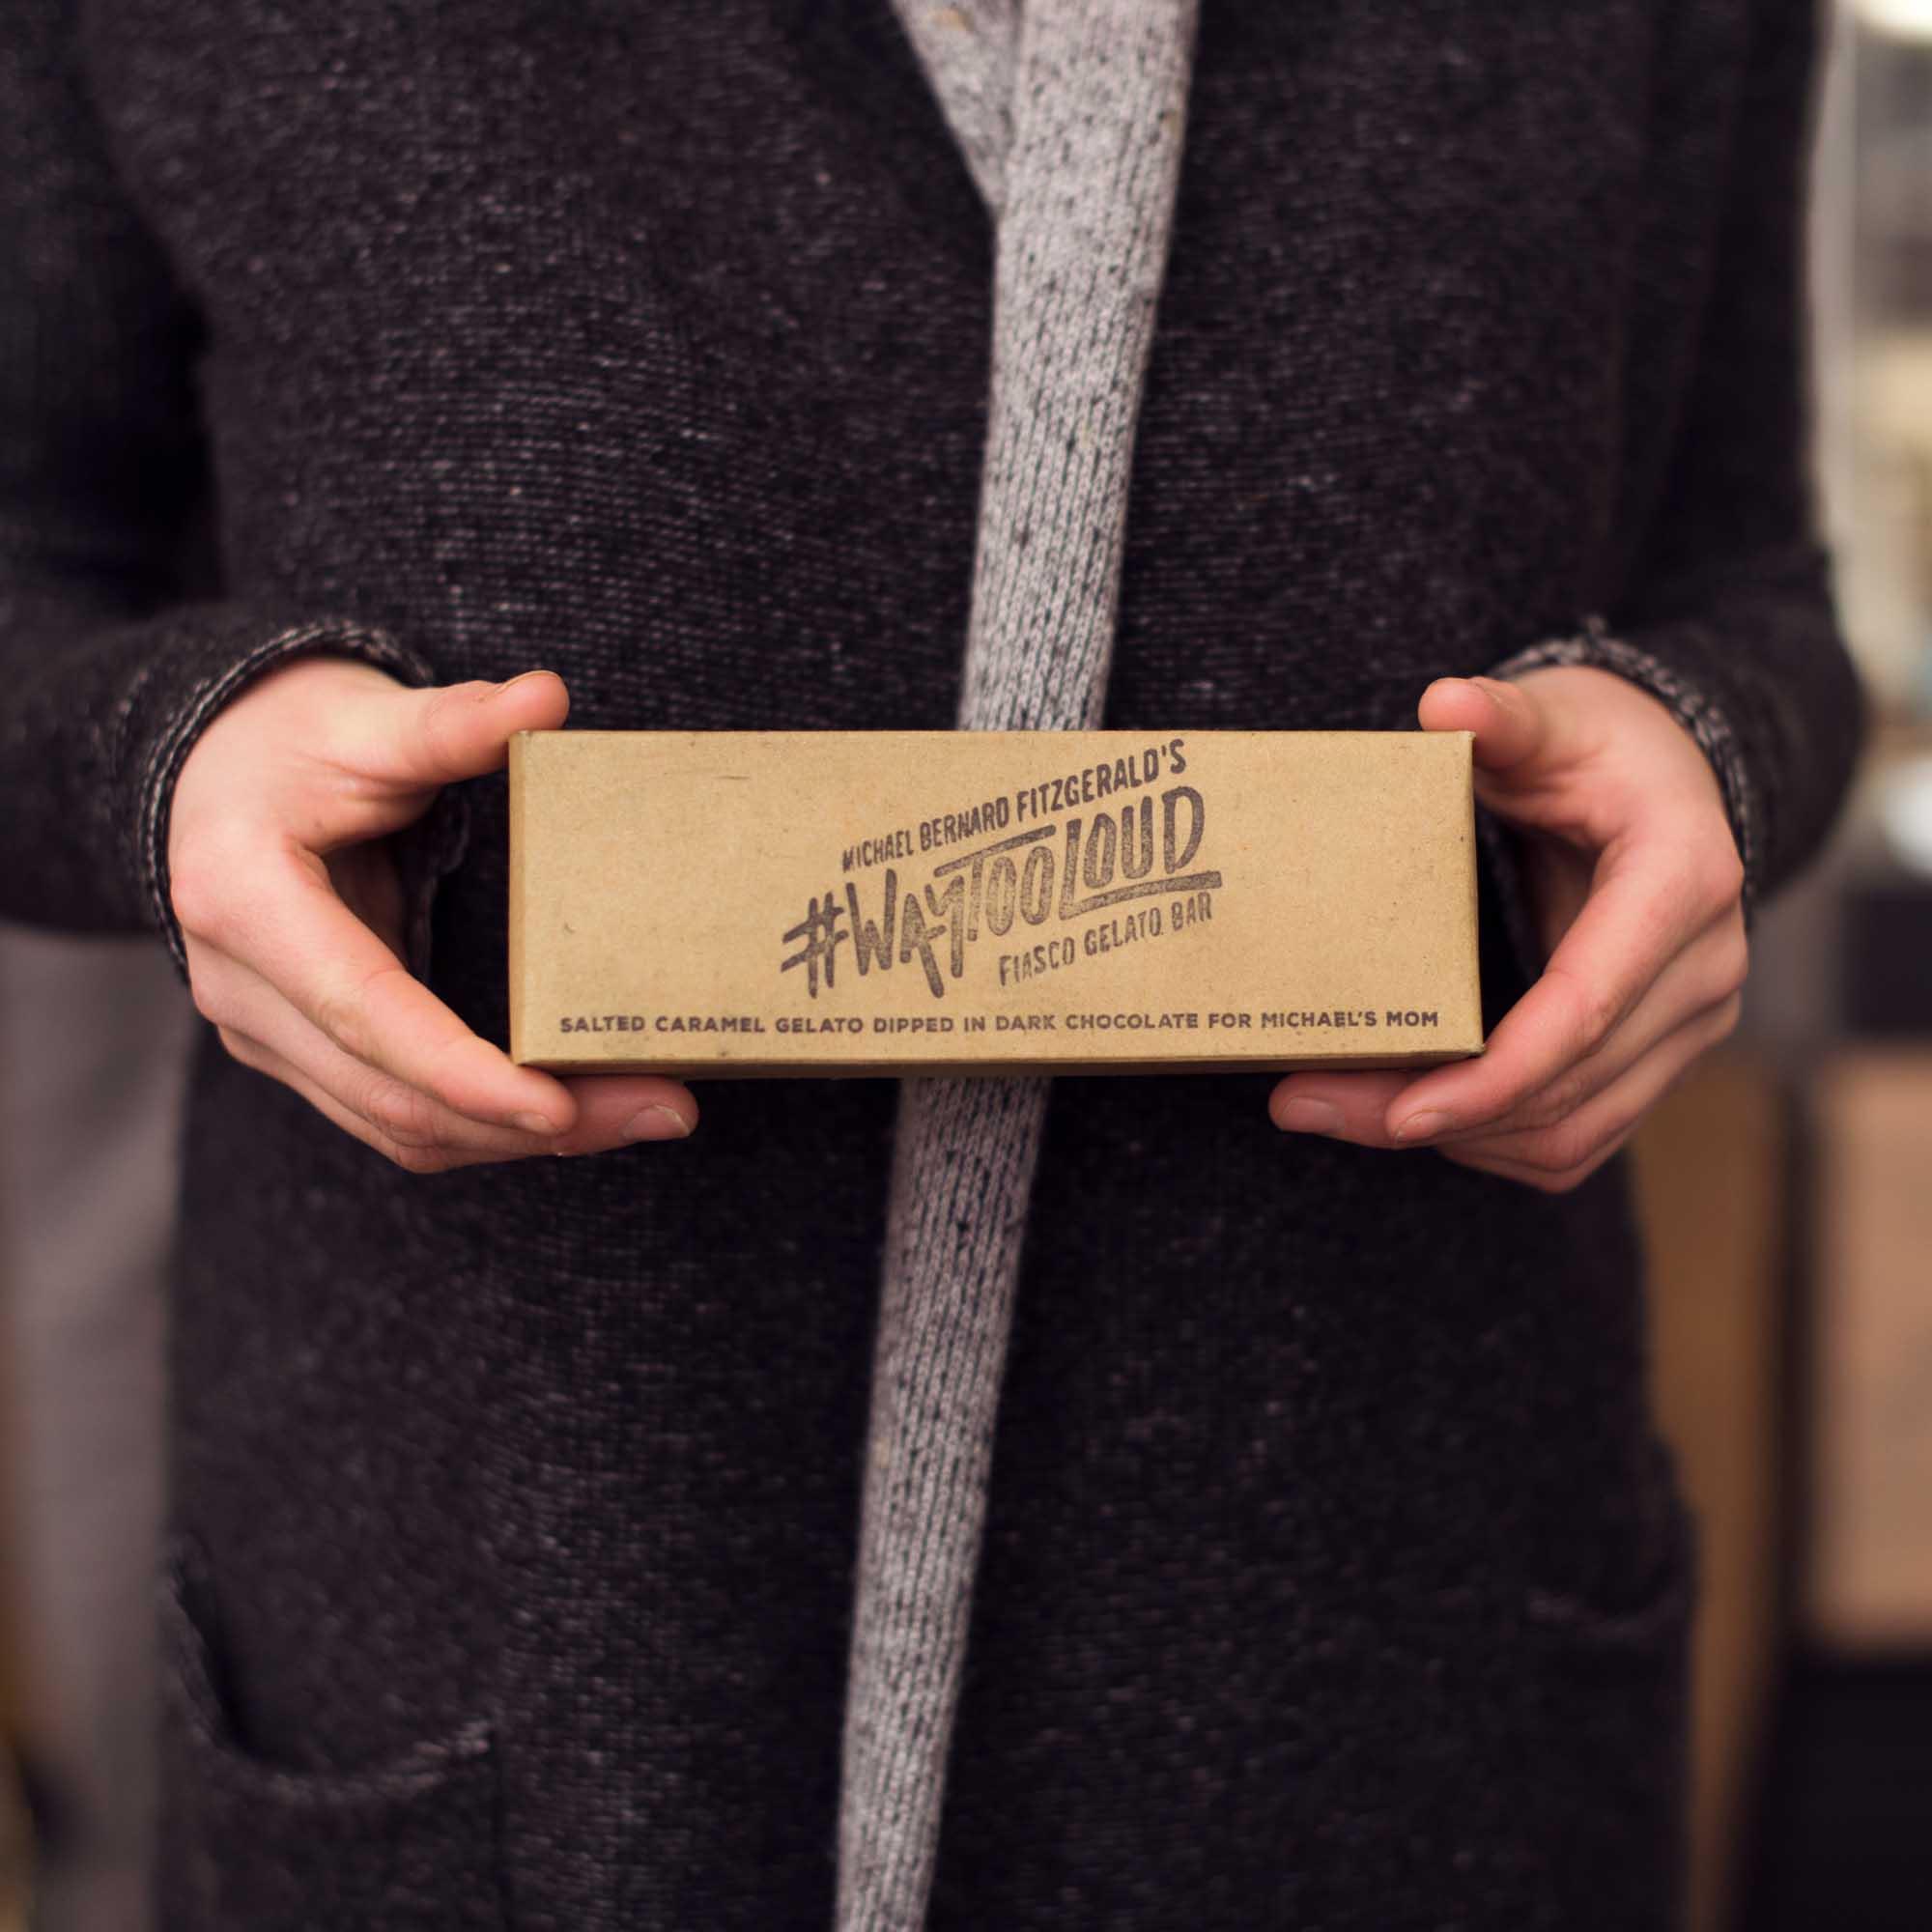 #WAYTOOLOUD - MICHAEL BERNARD FITZGERALDGelato Bar caramel salé trempédans le chocolat noir